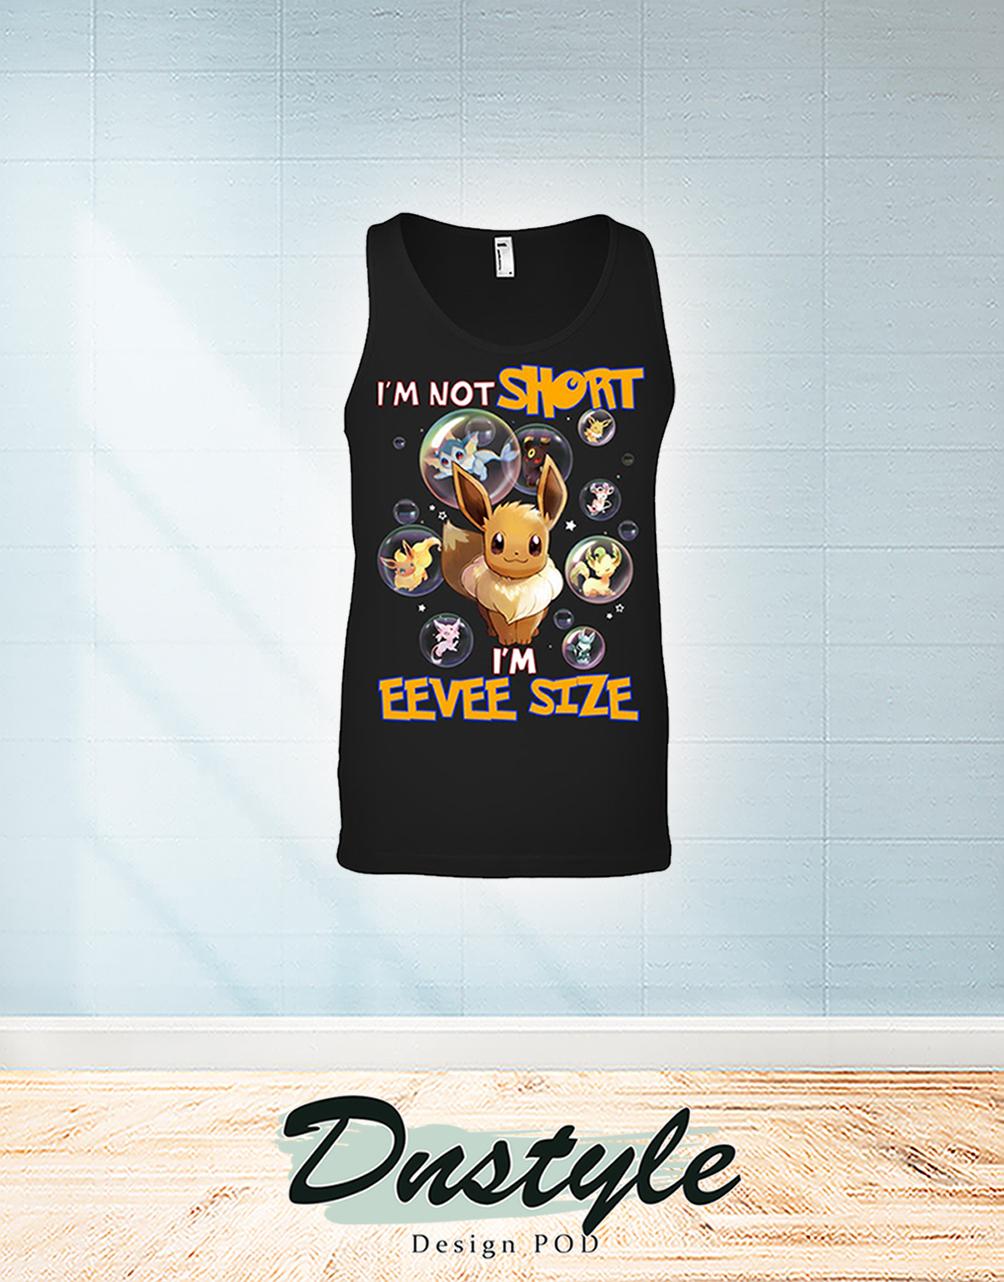 I'm not short I'm eevee size tank